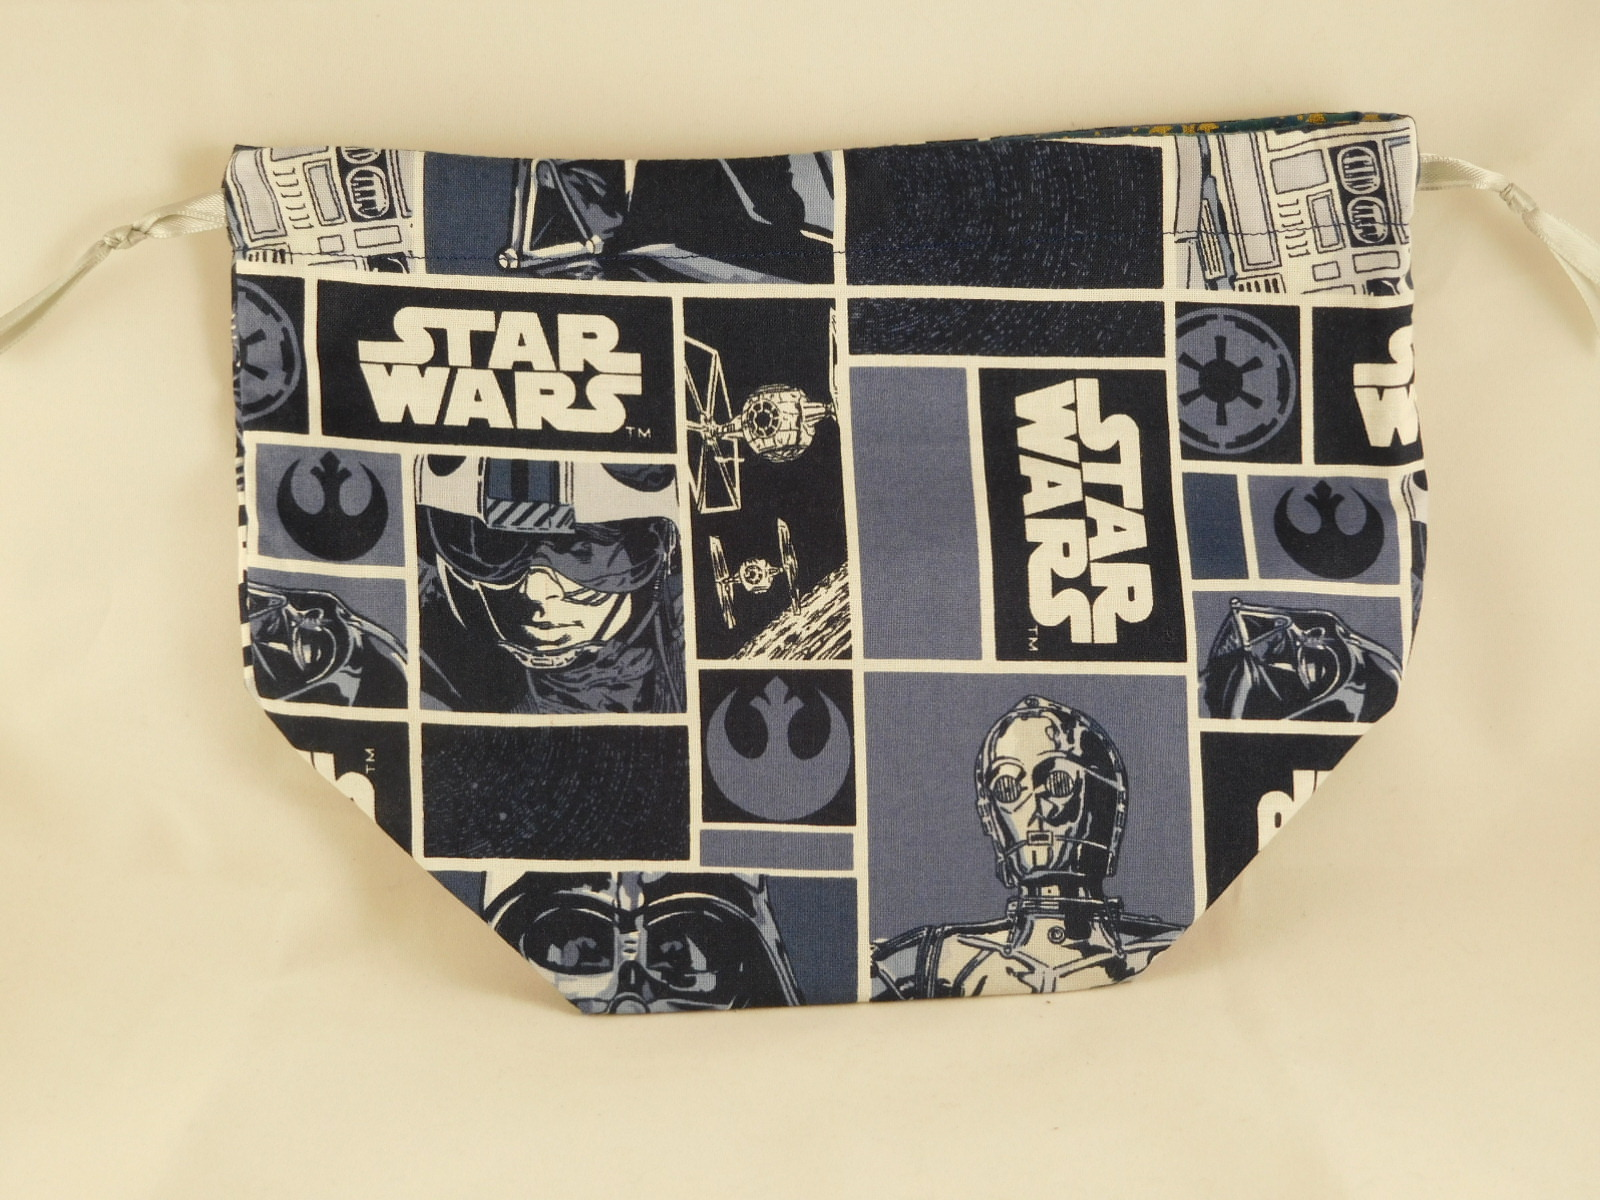 Star Wars Fabric Drawstring Bag